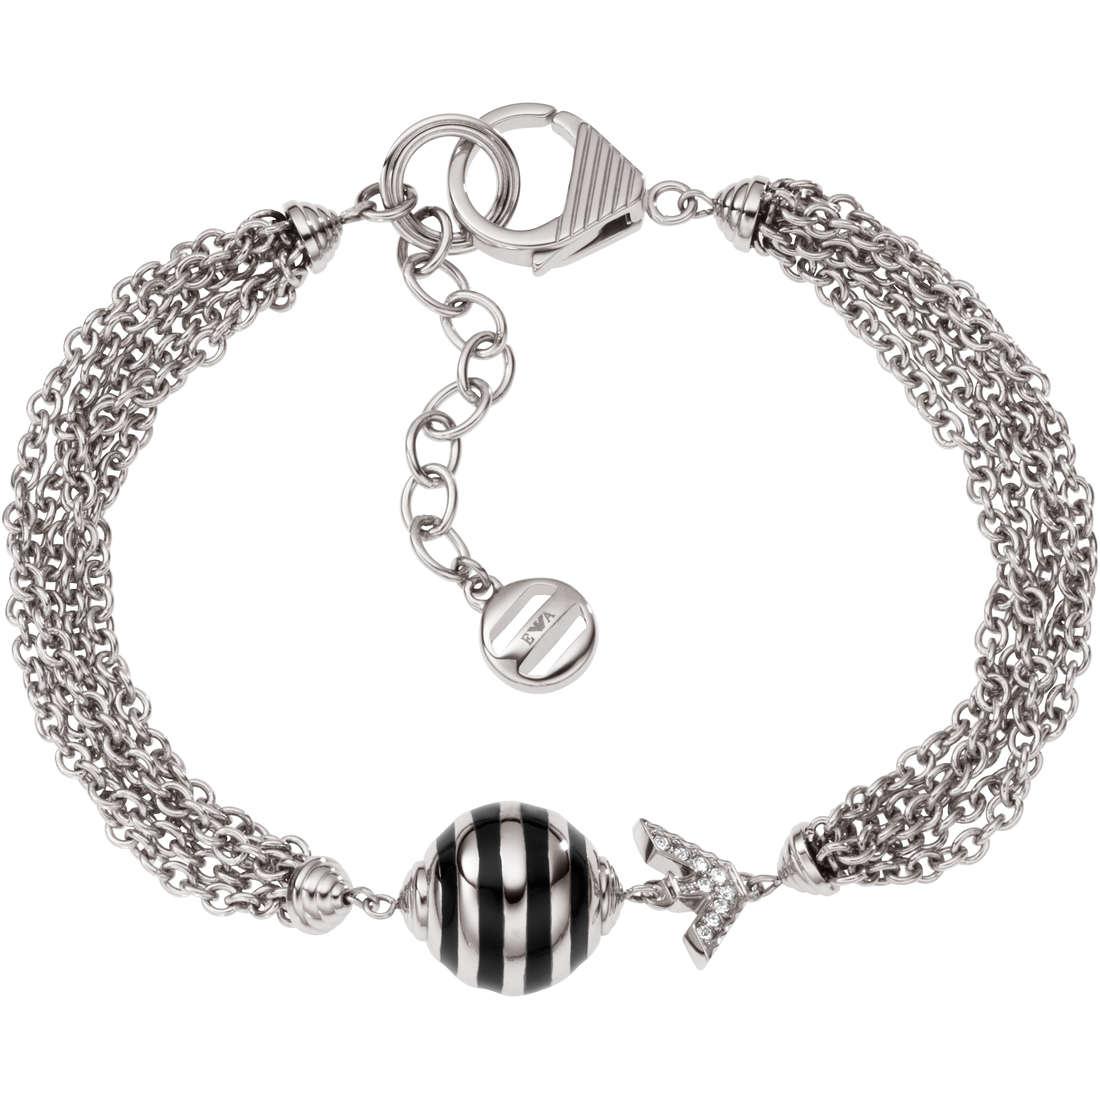 bracelet woman jewellery Emporio Armani EGS1683040